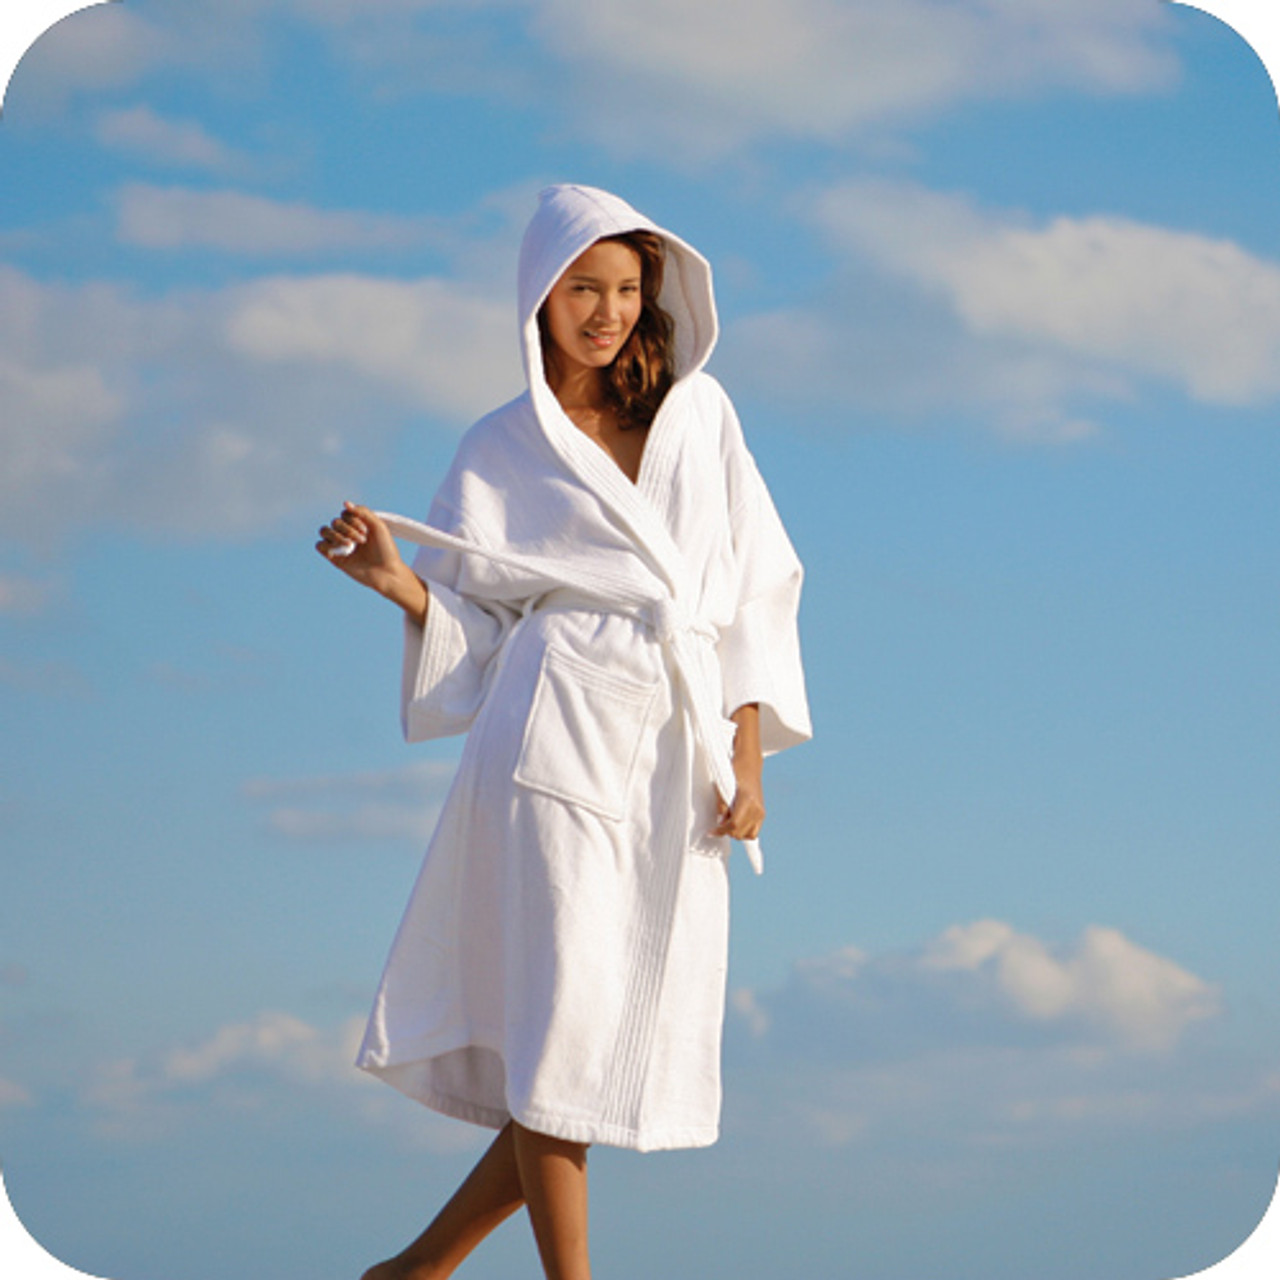 This hotel bathrobe is super cute with a hood!